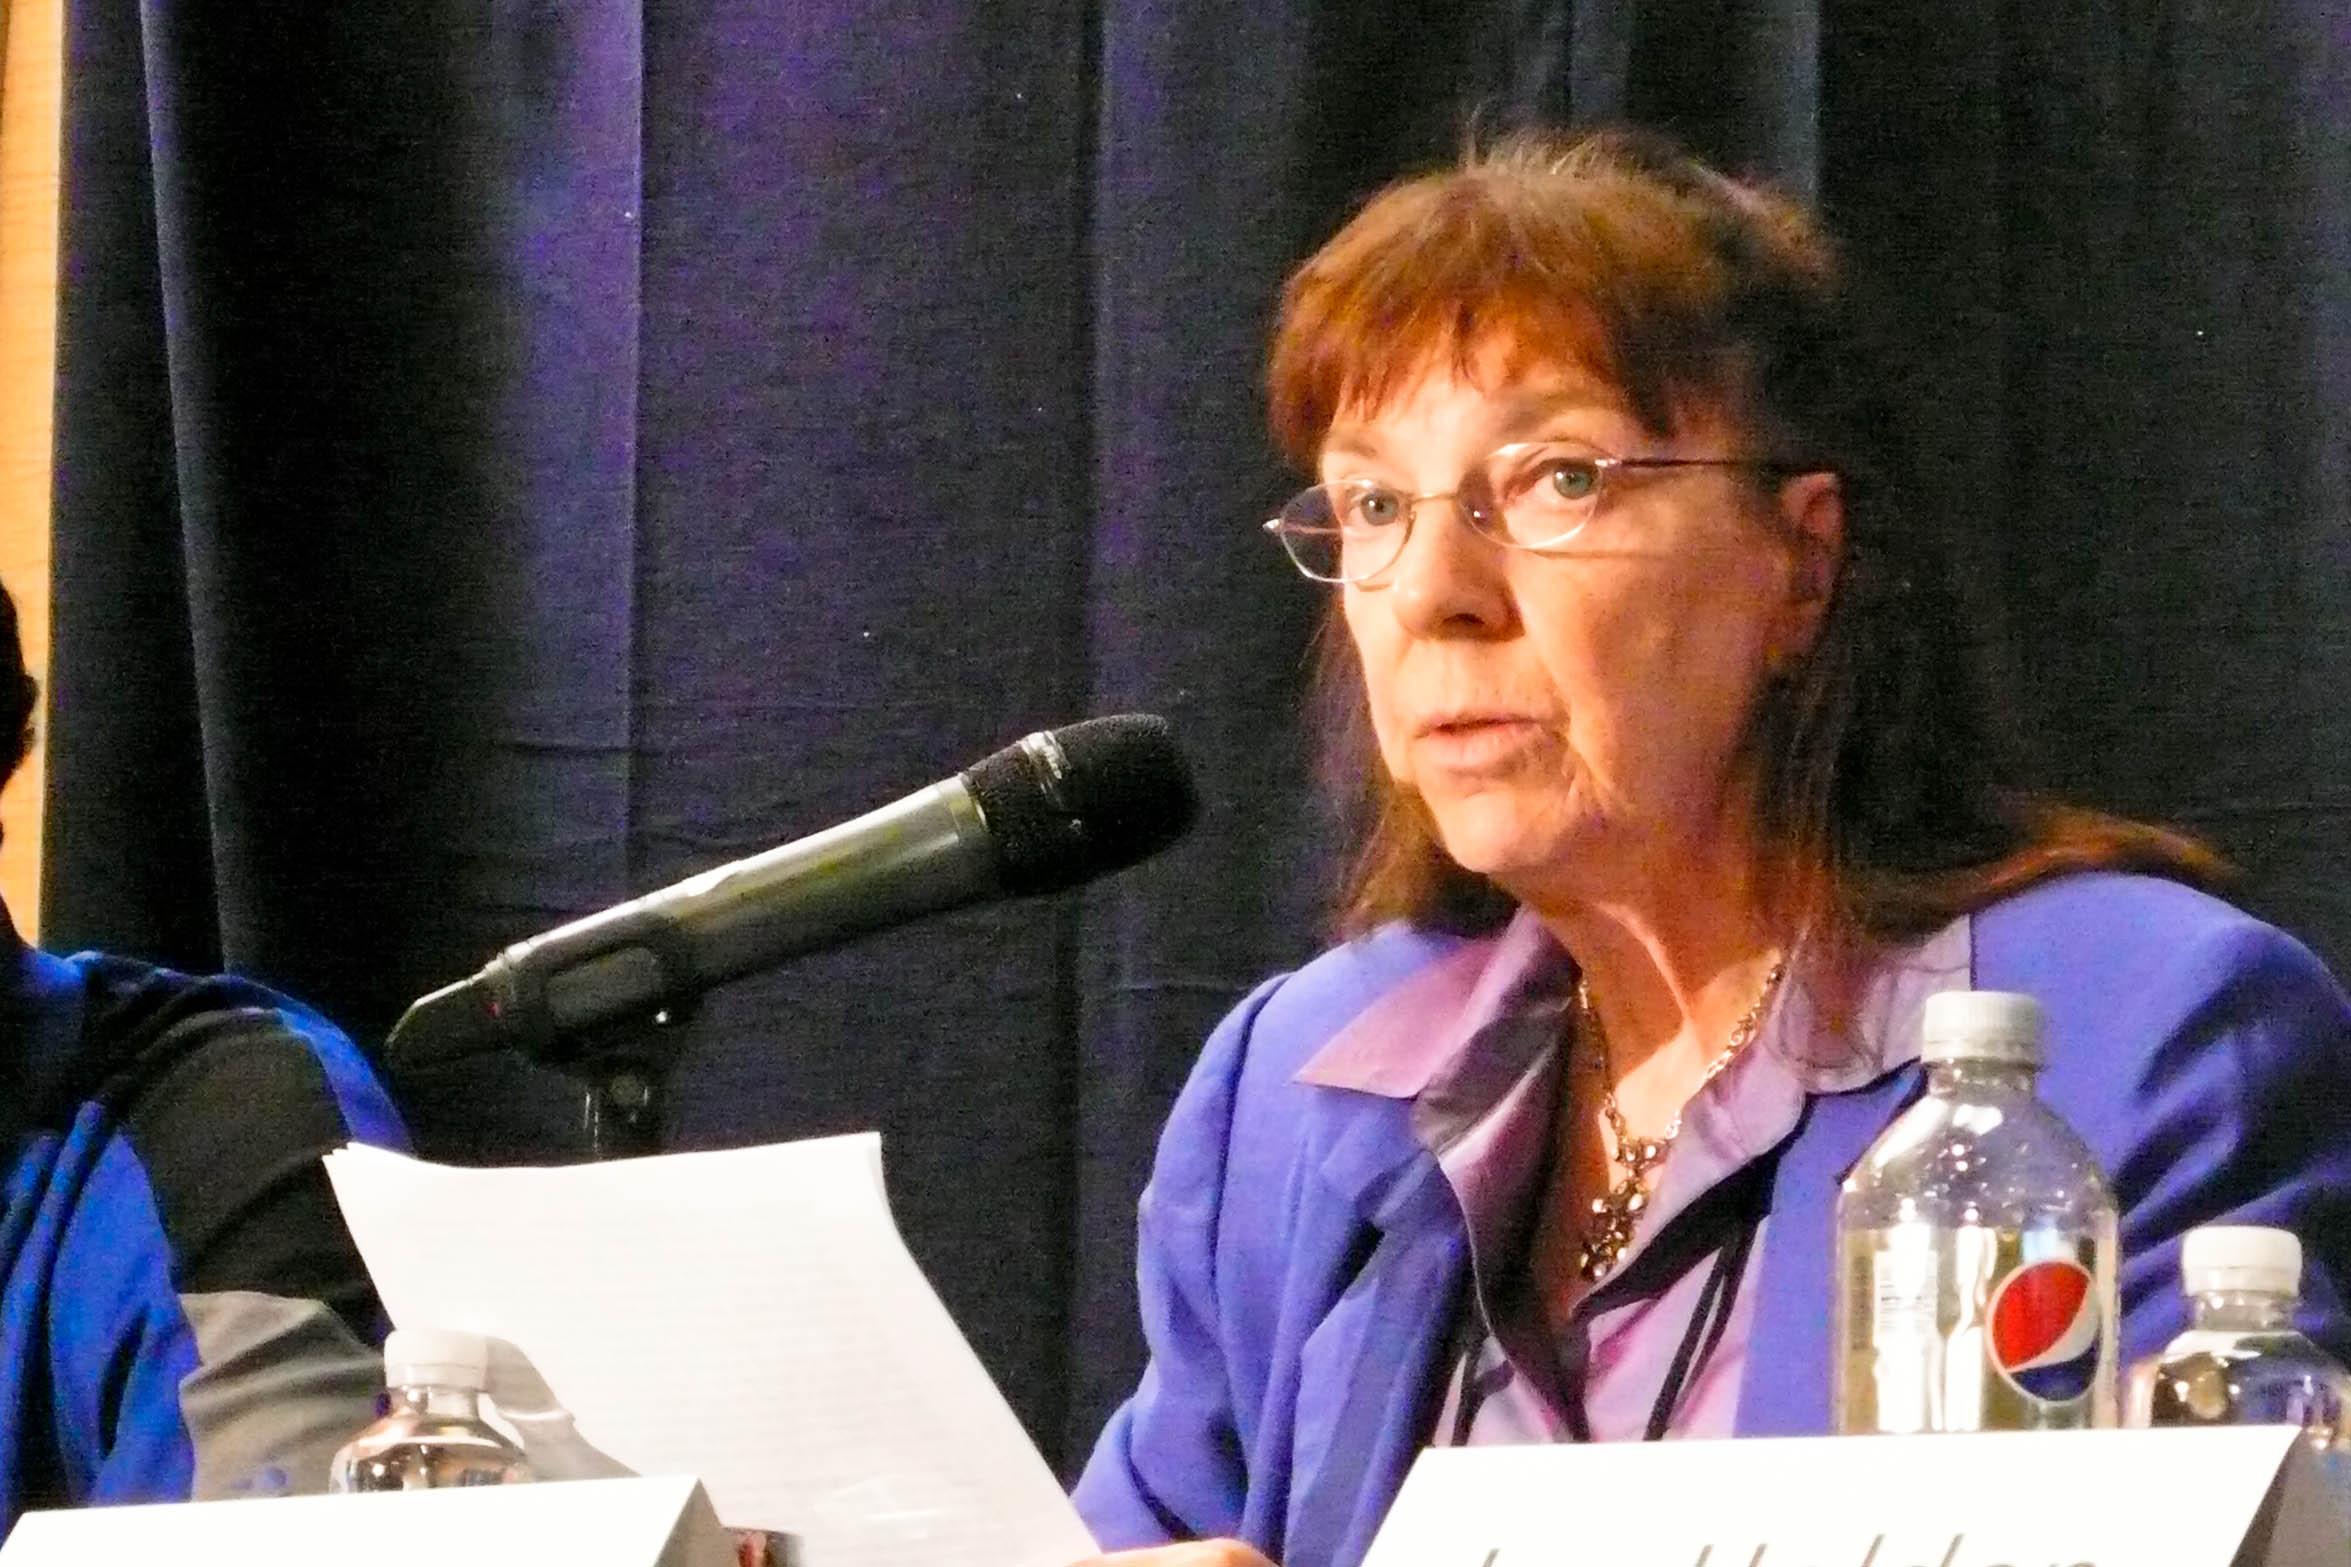 Suzanne Mays